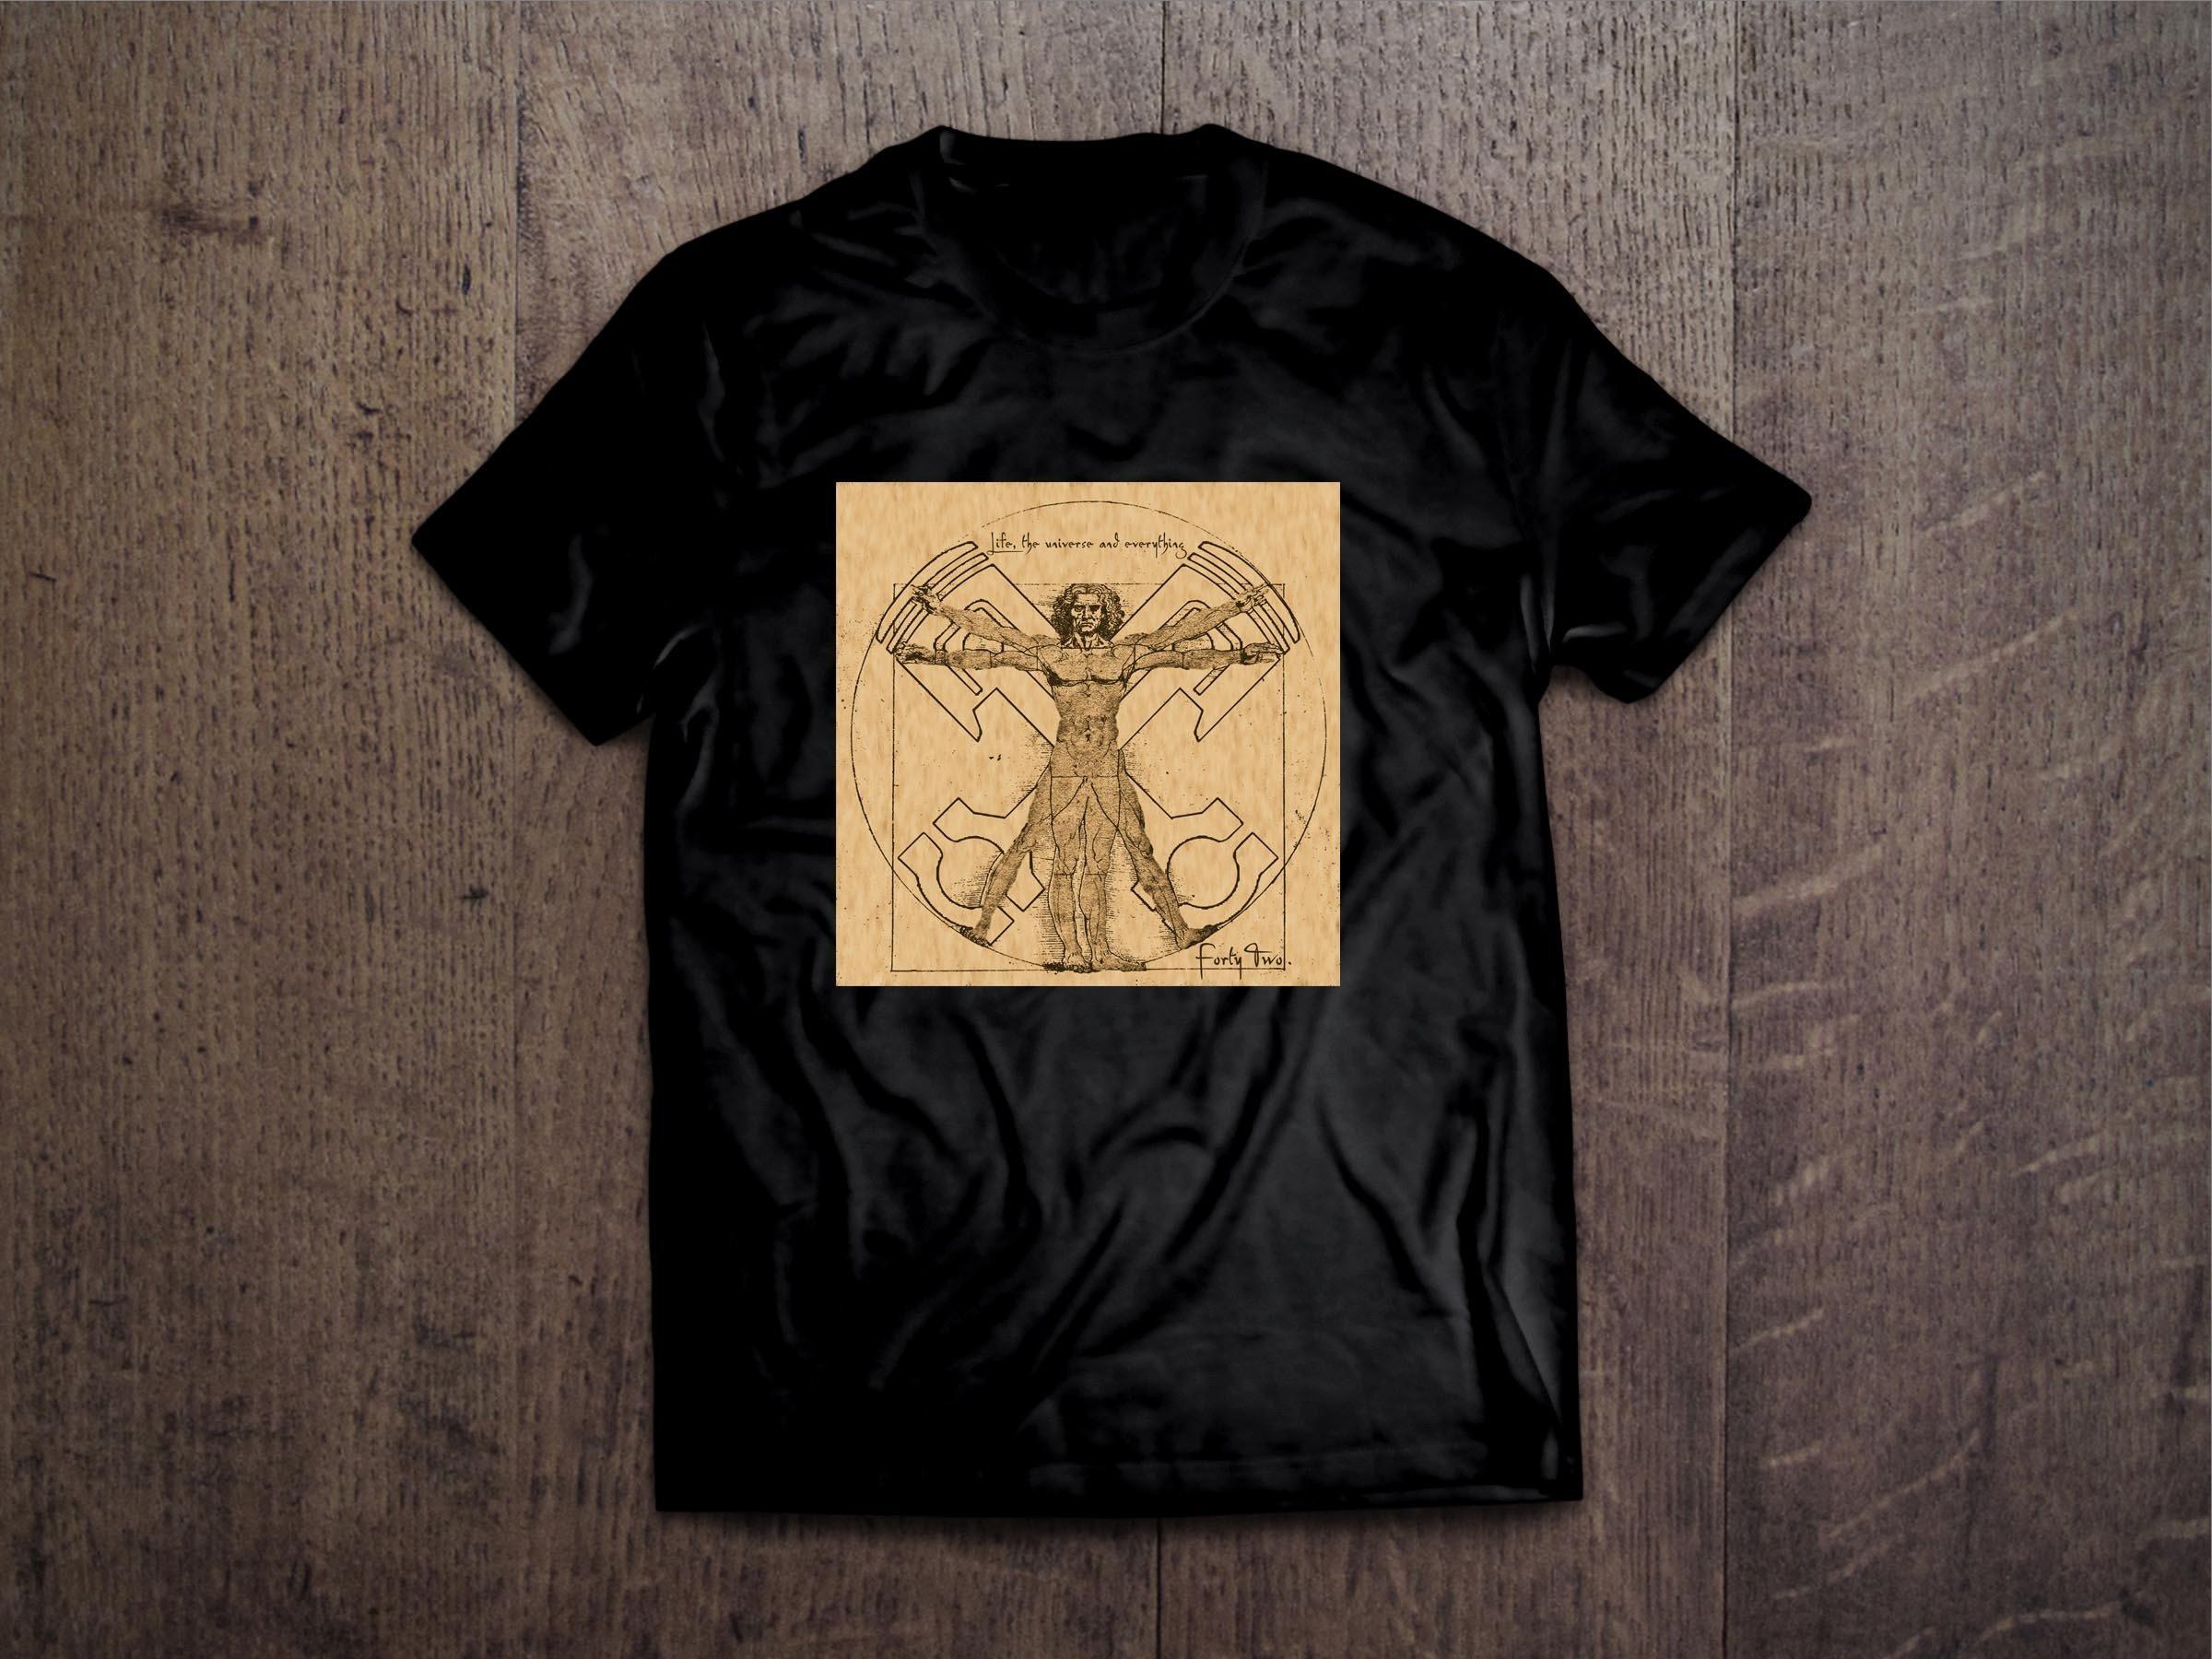 Vitruvian Petrolhead Chest Candy Vitruvian tshirt